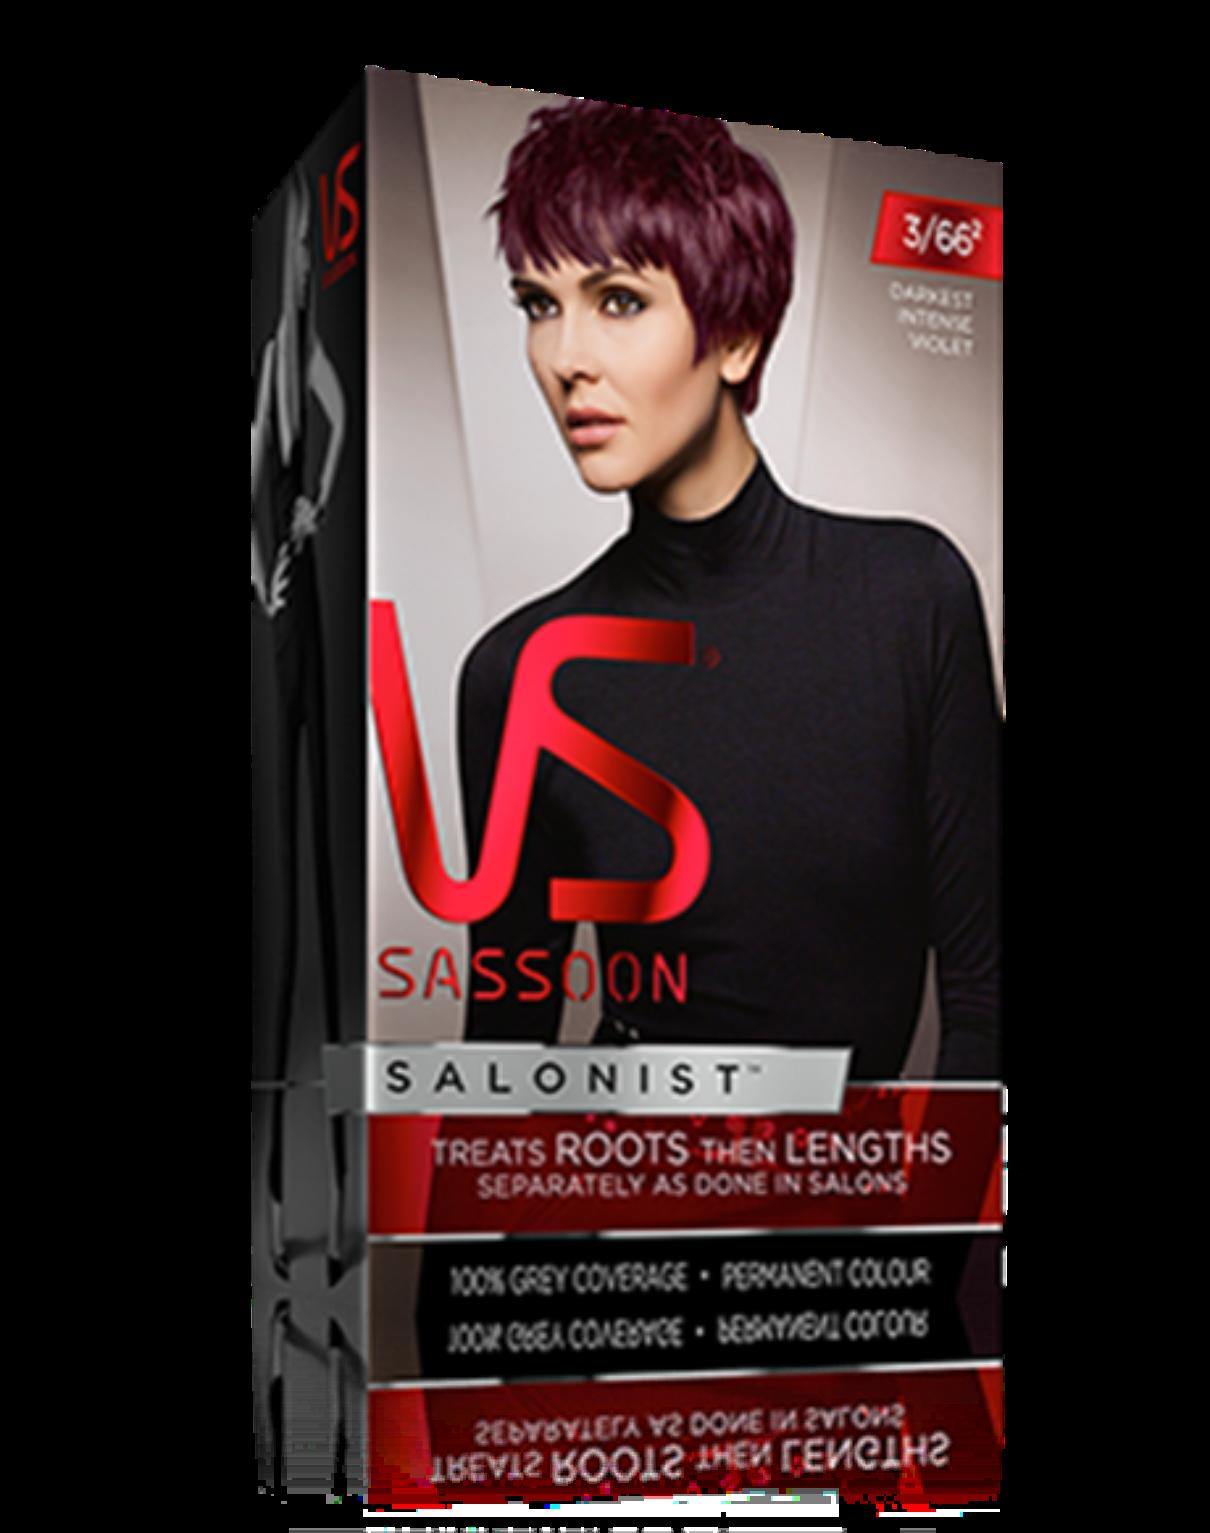 Darkest Intense Violet Vidal Sassoon Salonist